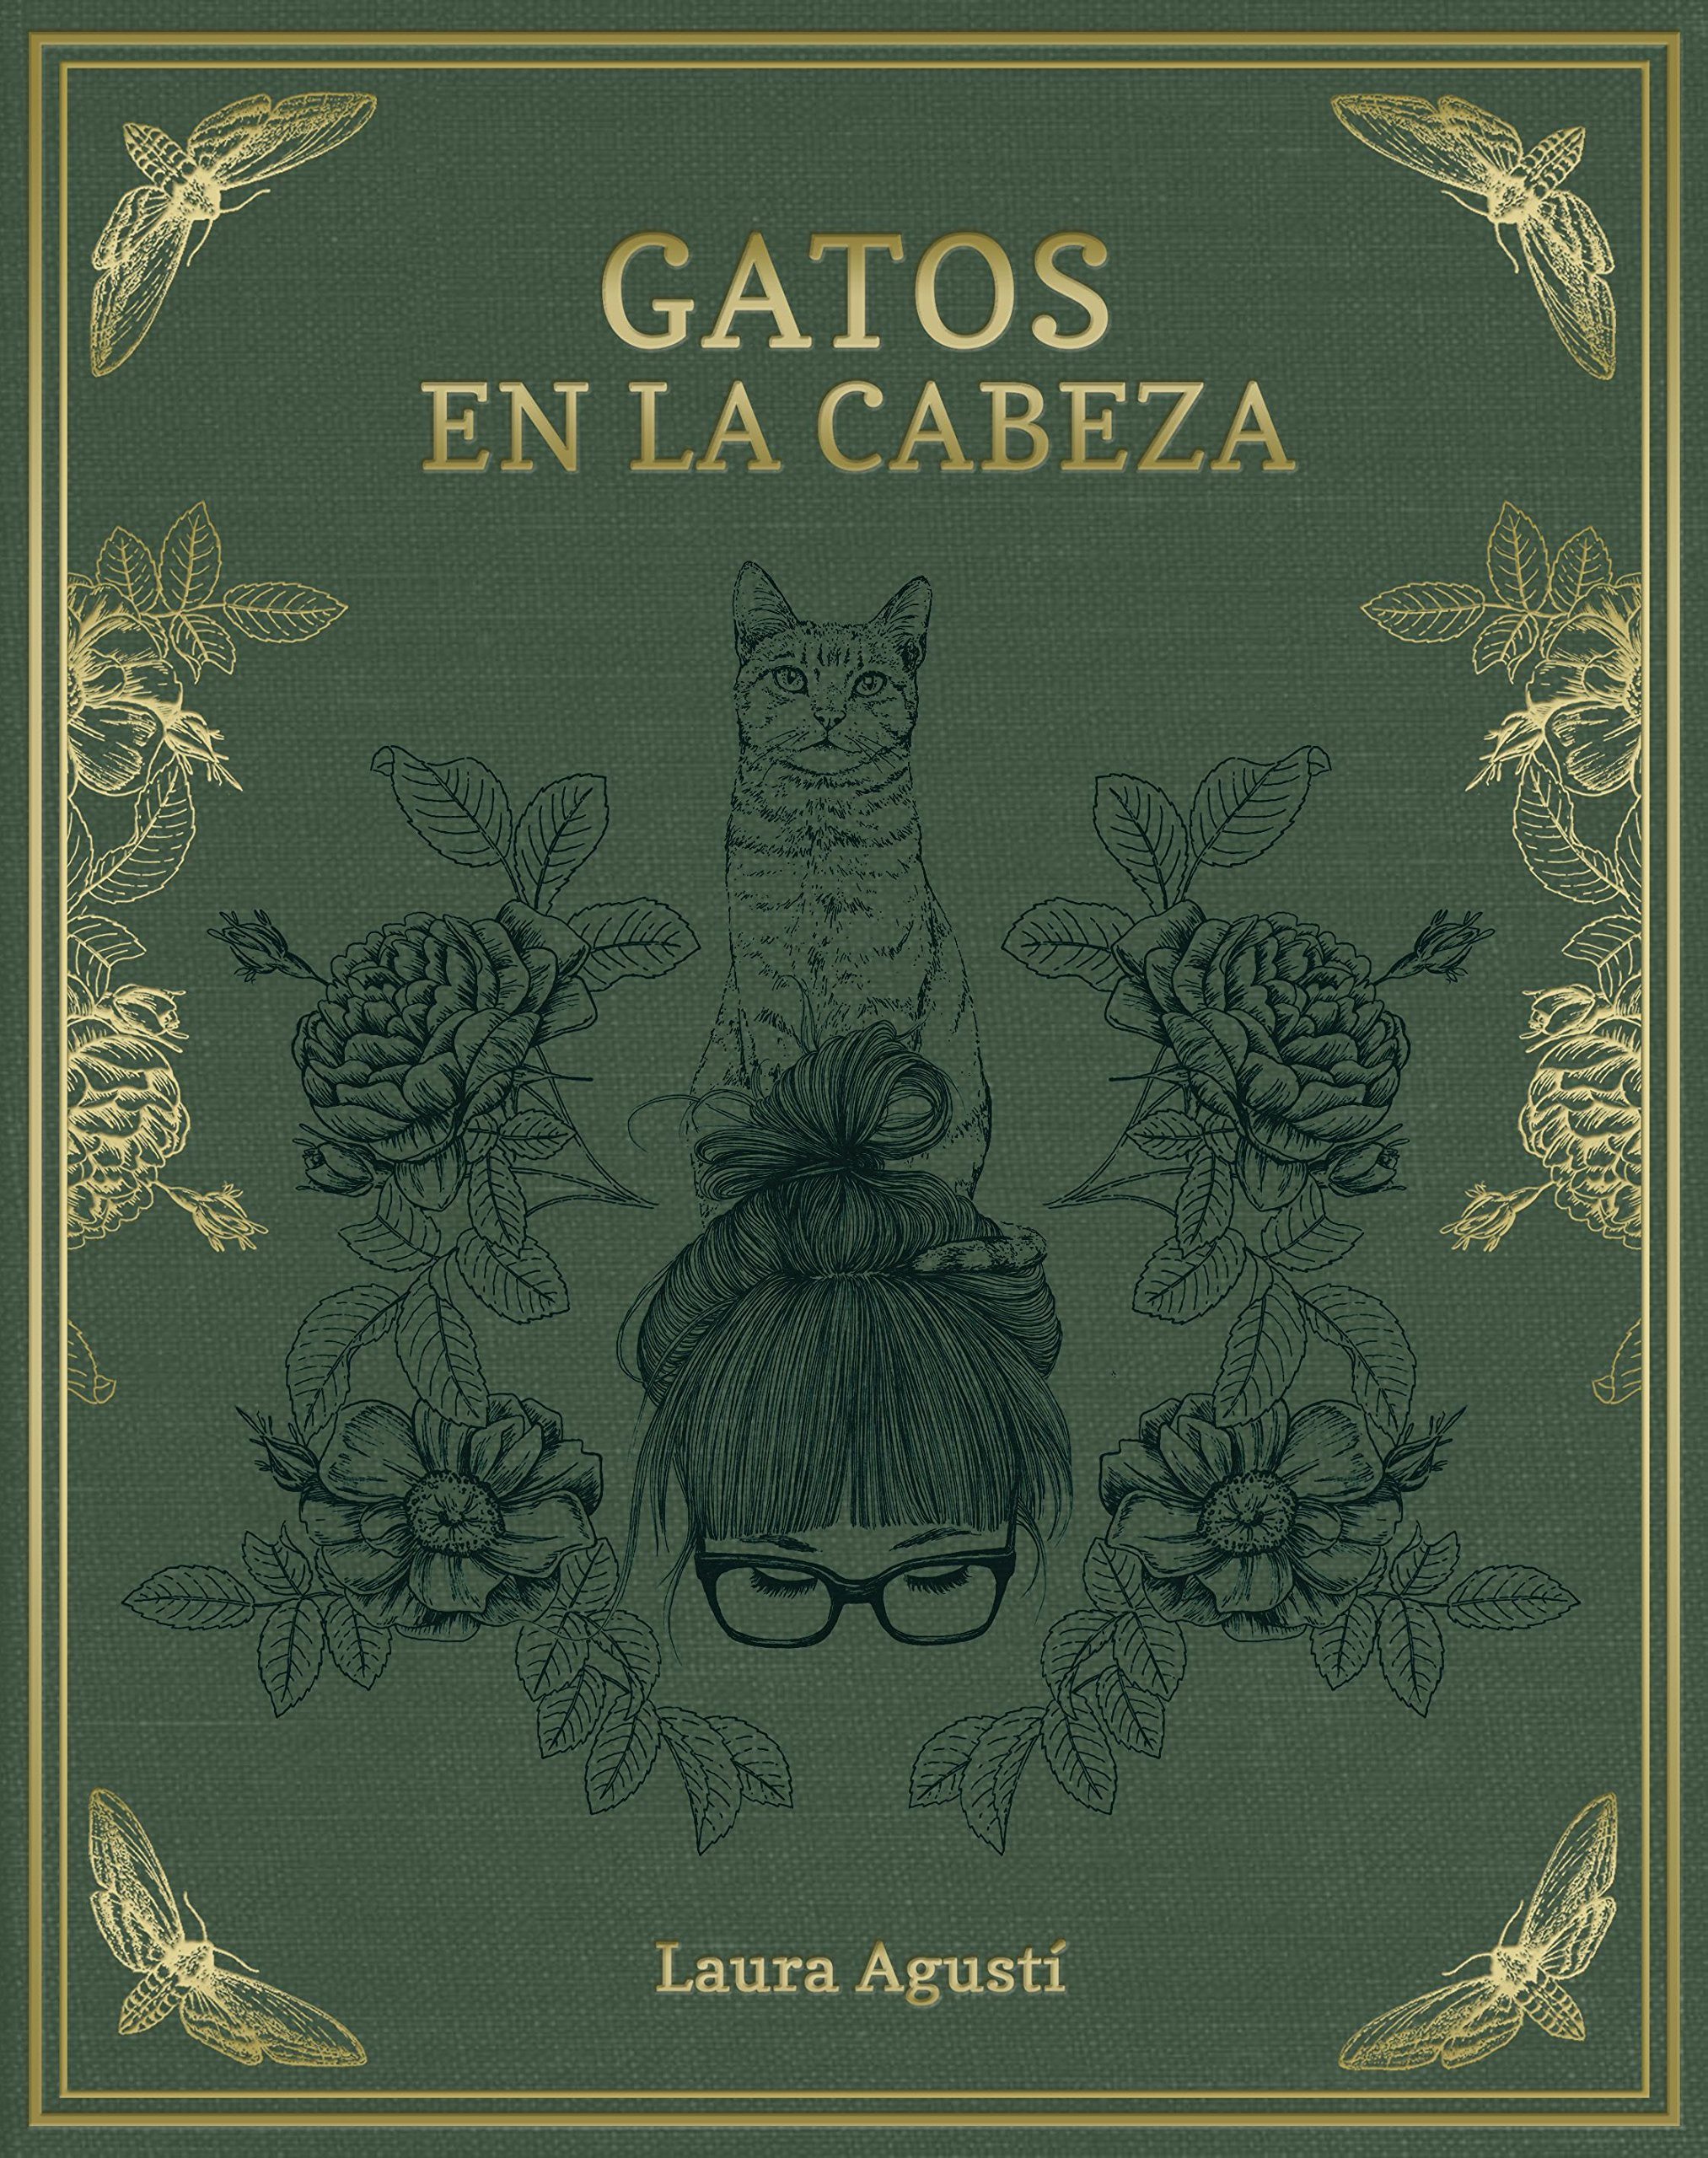 Gatos en la cabeza - Laura Agustí